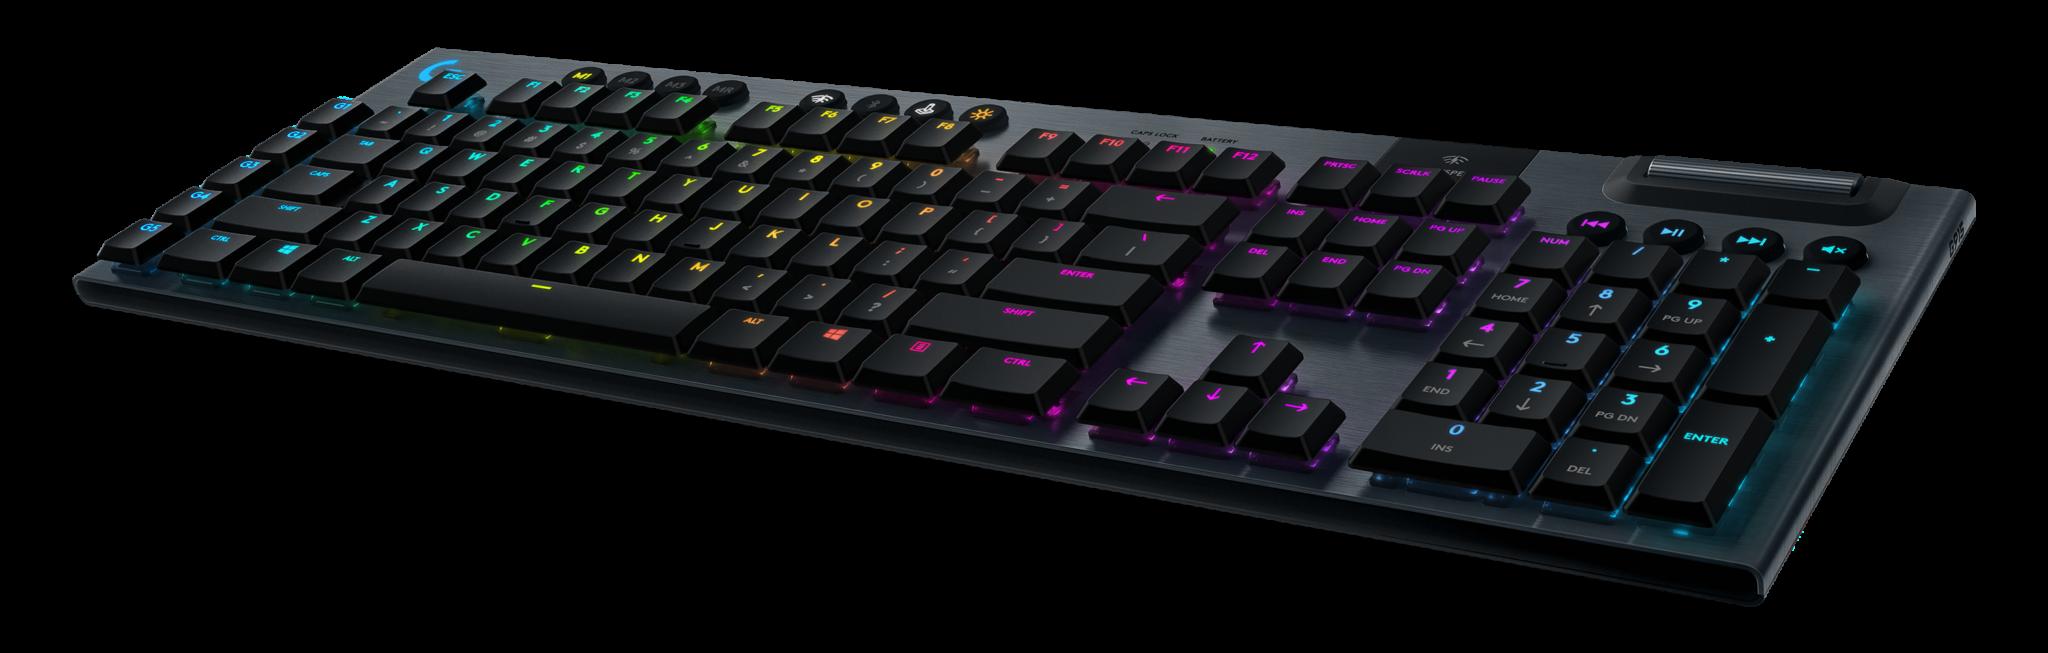 Logitech G915 Lightspeed Wireless Mechanical Keyboard